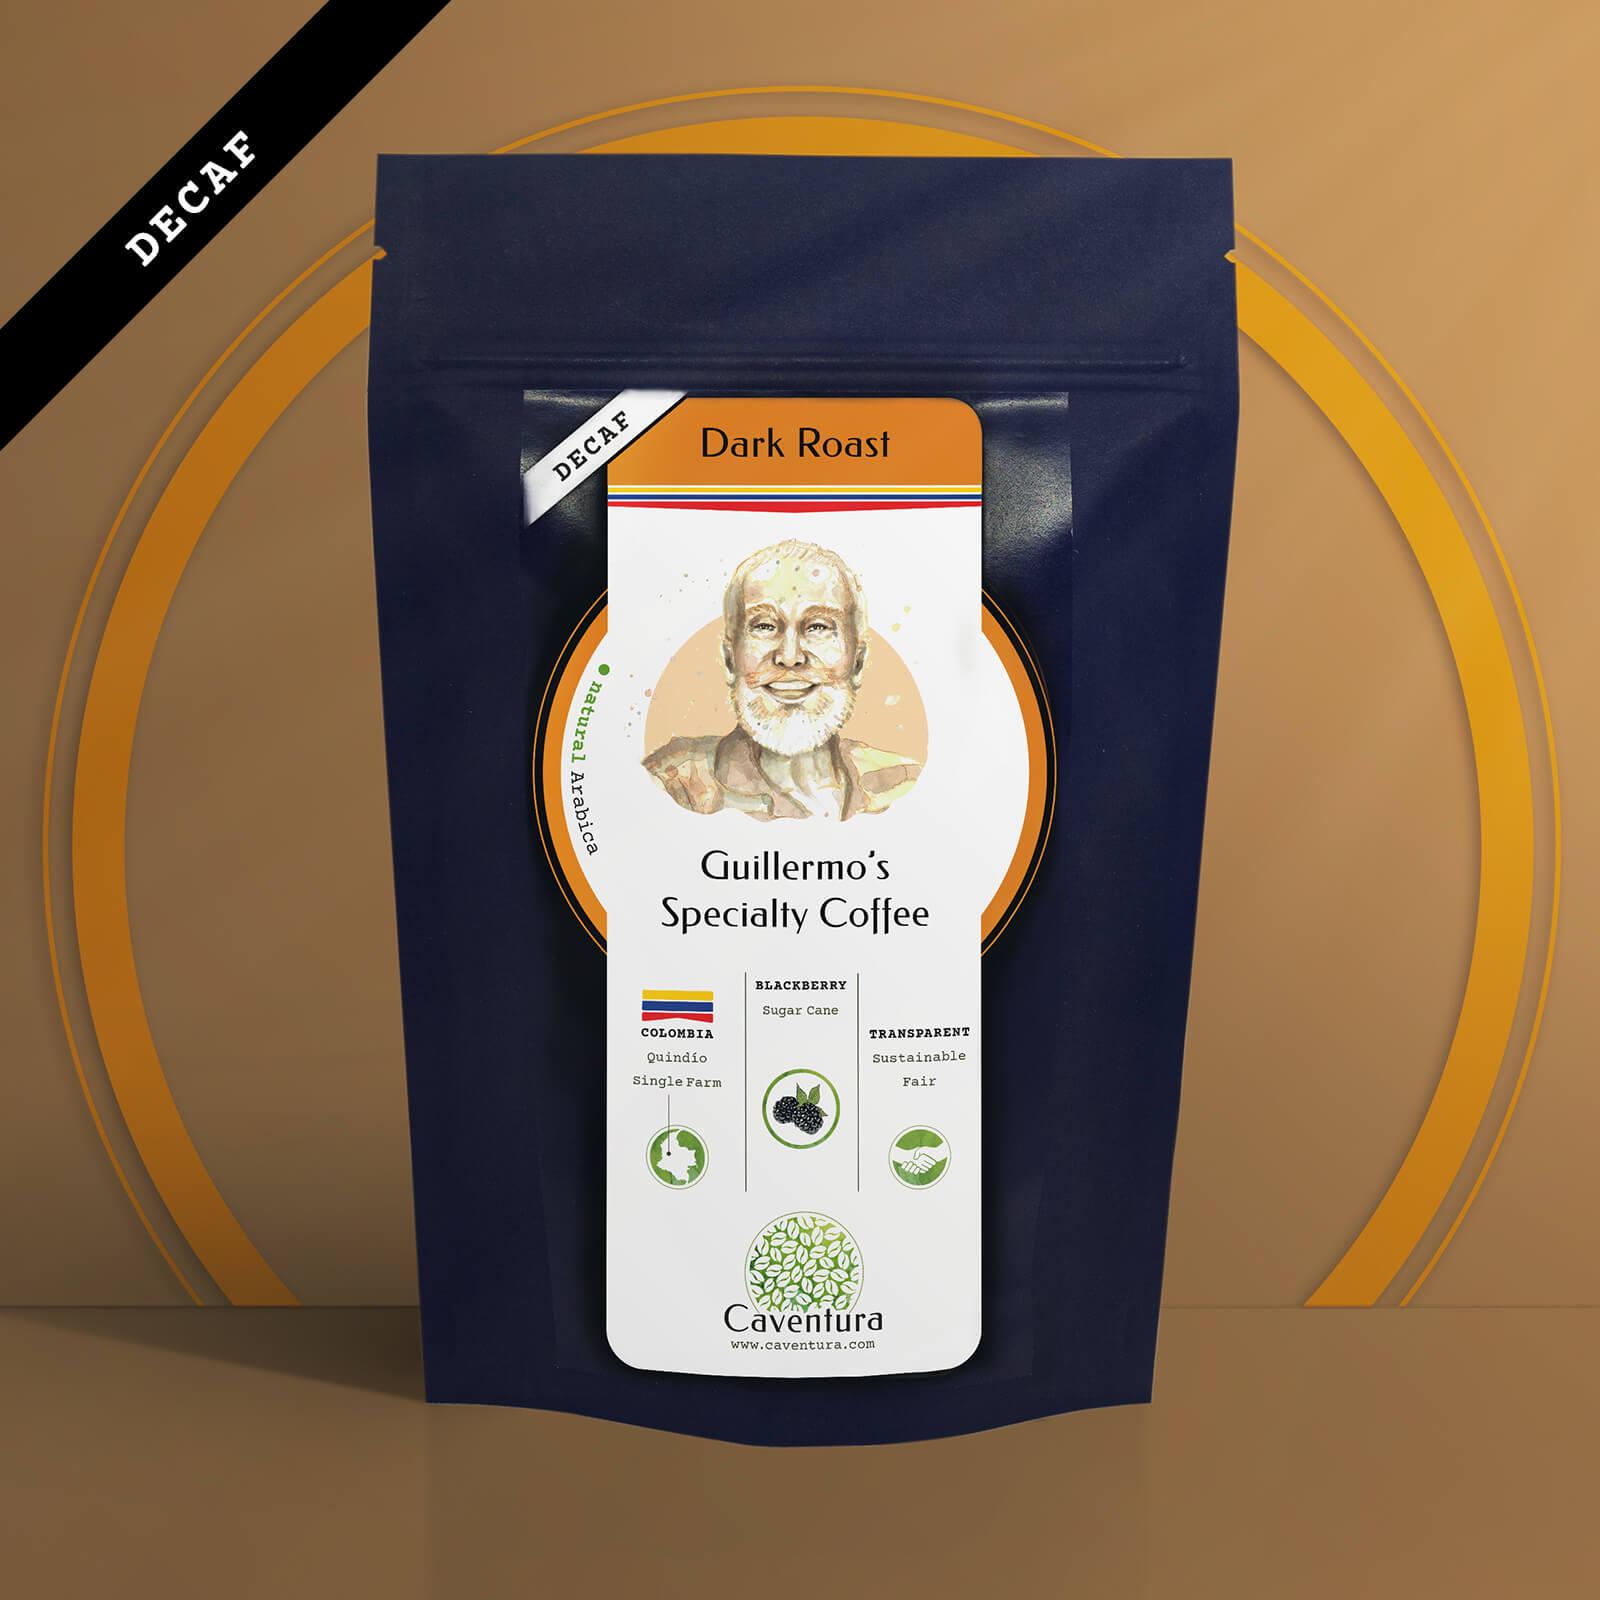 Guillermo's Specialty DECAF Coffee – Dark Roast